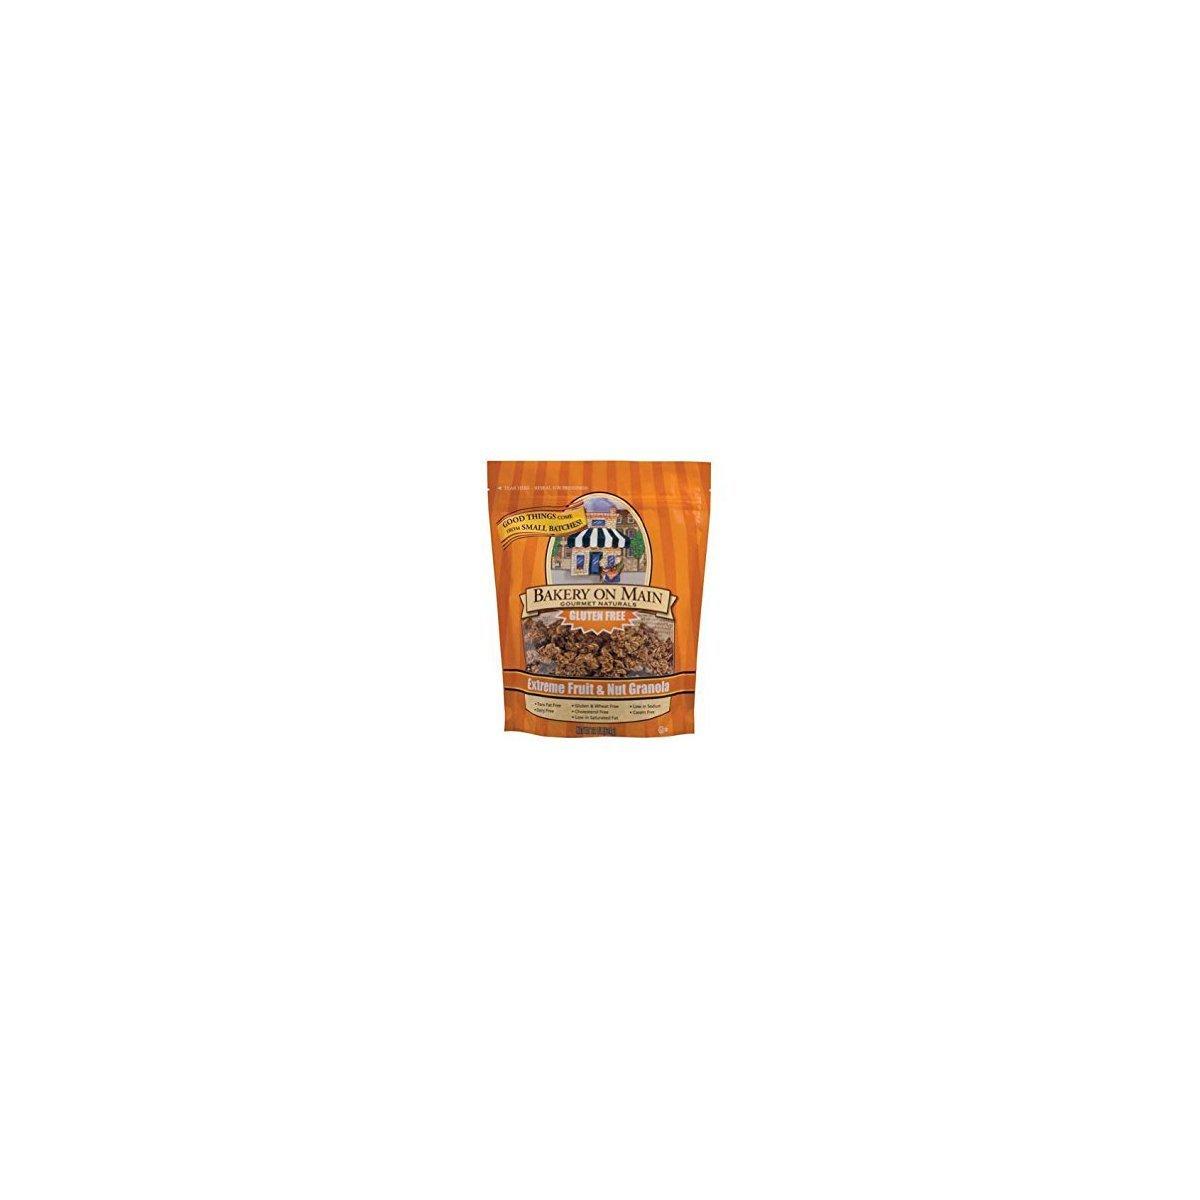 Gluten Free Extreme Fruit Nut Granola 22 Ounces (Case of 4)